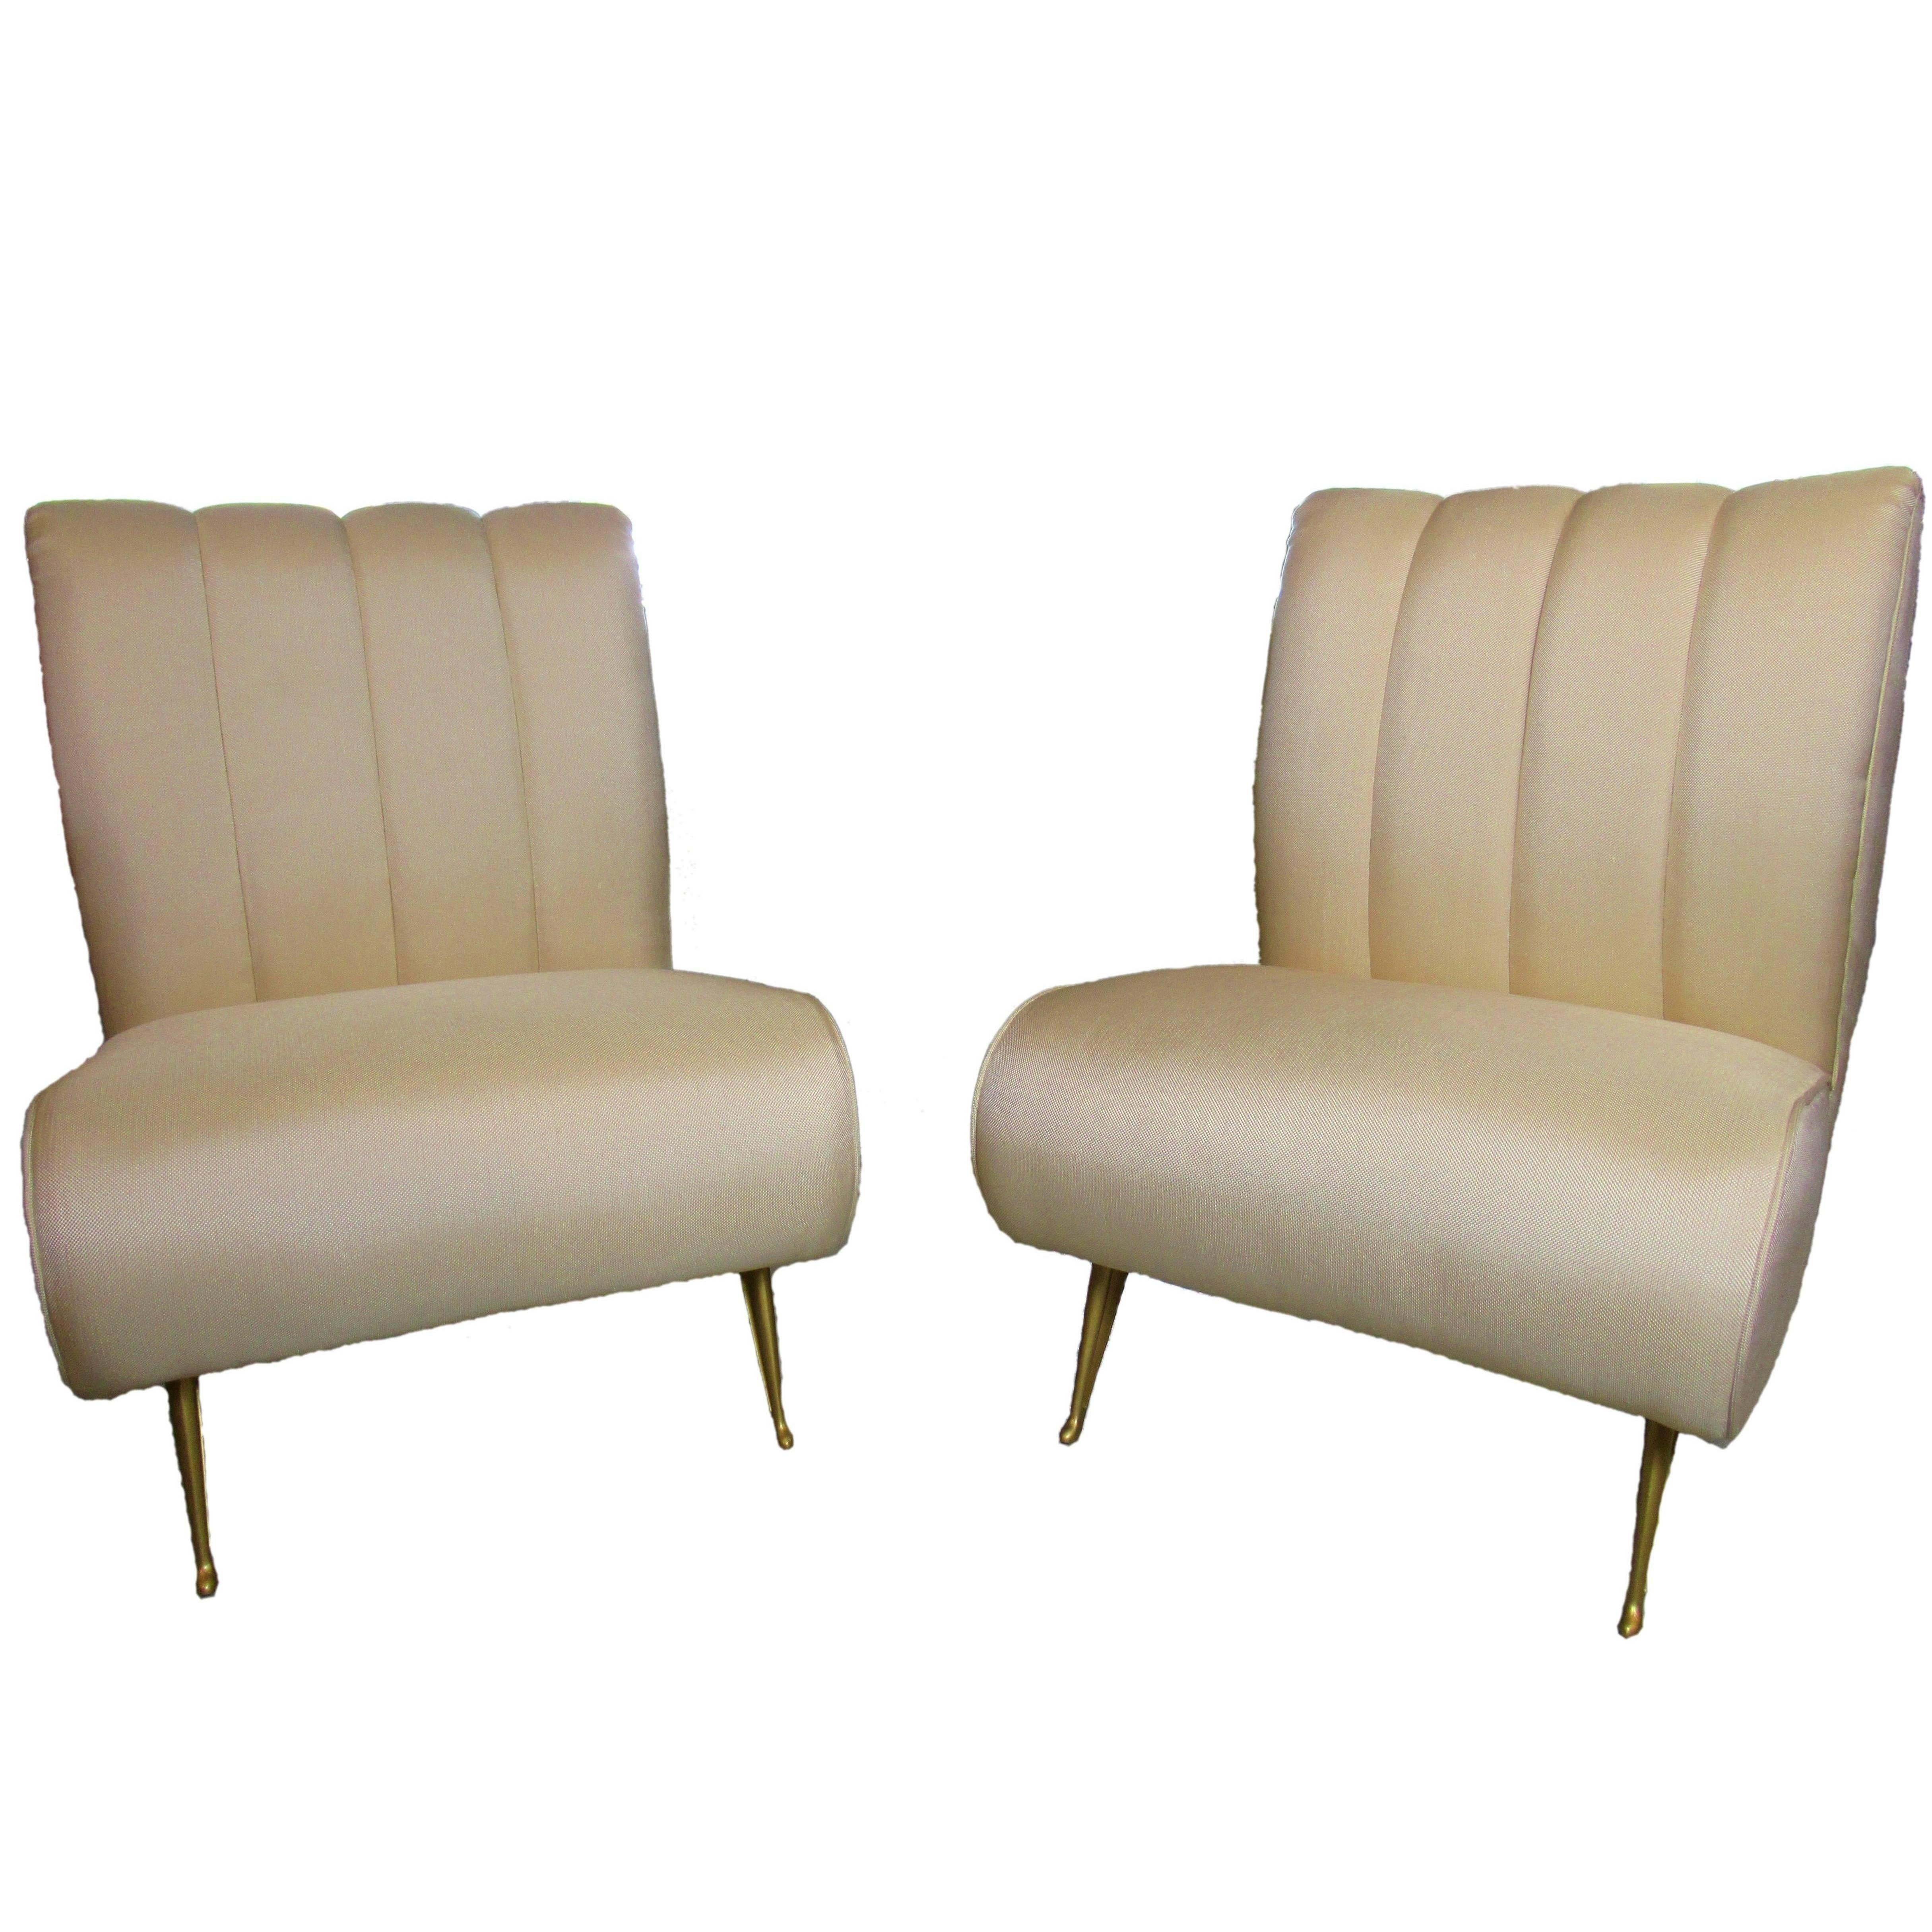 Pair of Italian Modern Slipper Chairs, Isa, Attributed to Gio Ponti